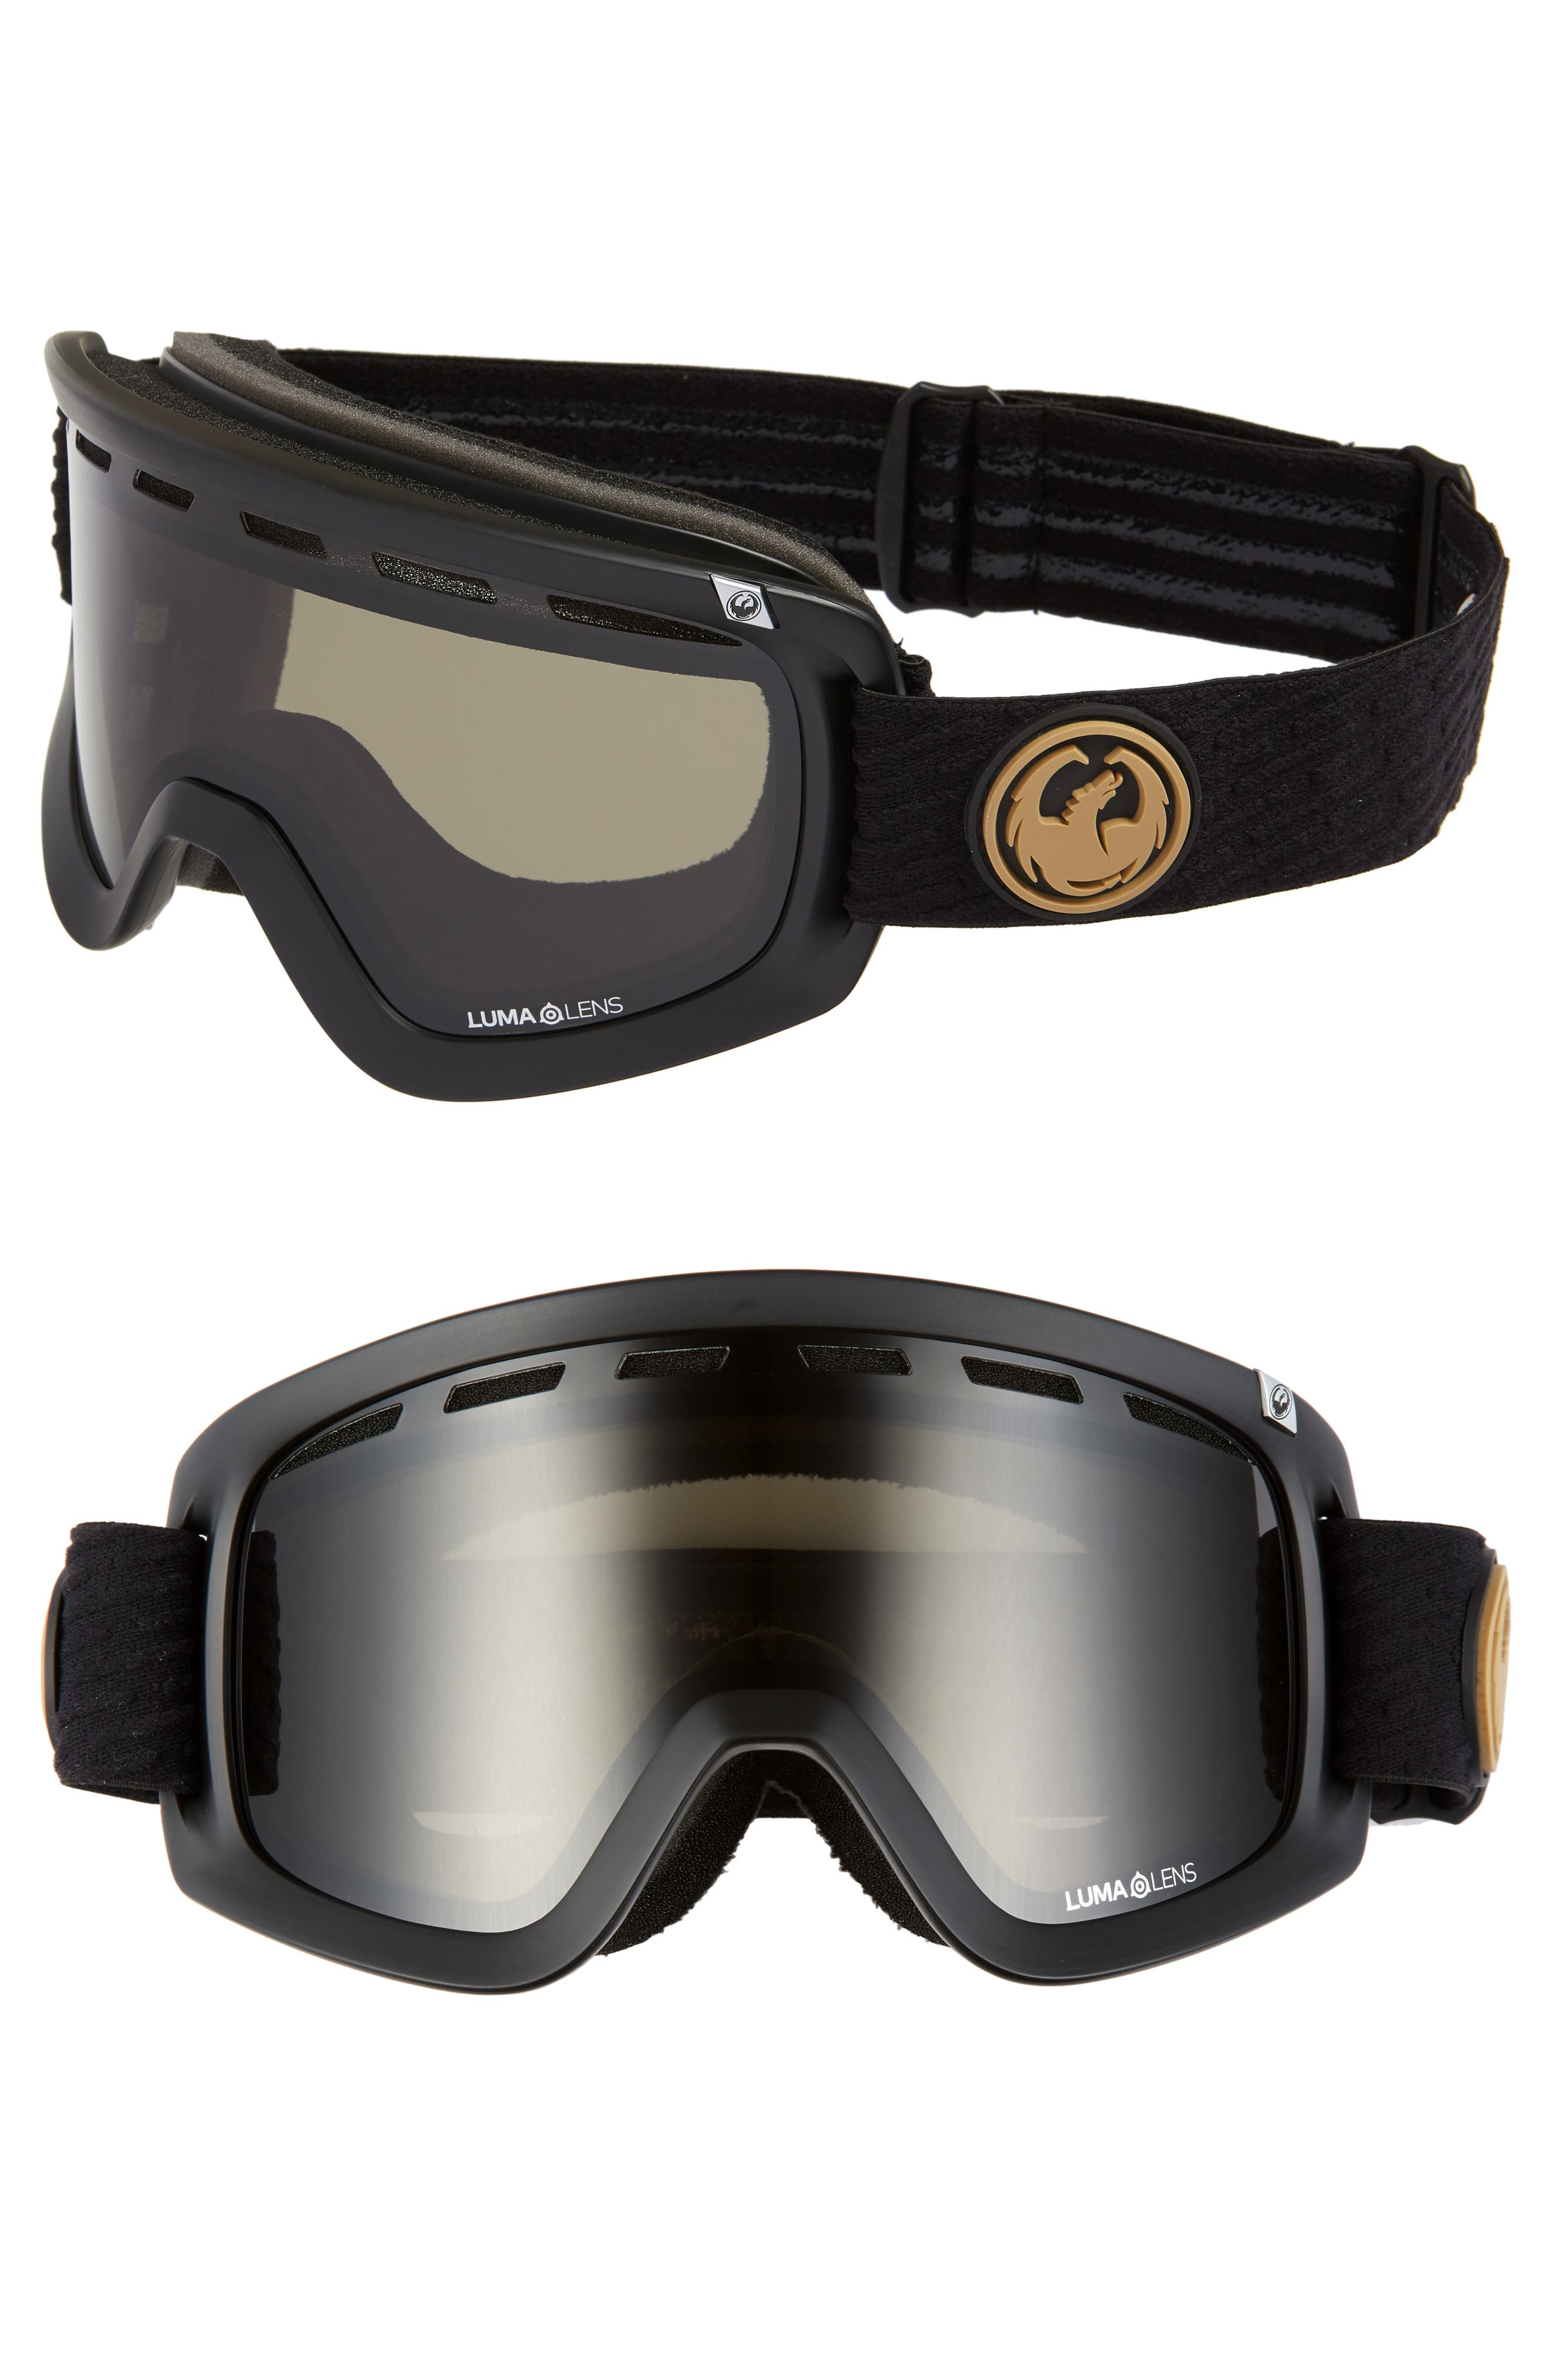 D1 Otg Snow Goggles With Bonus Lens